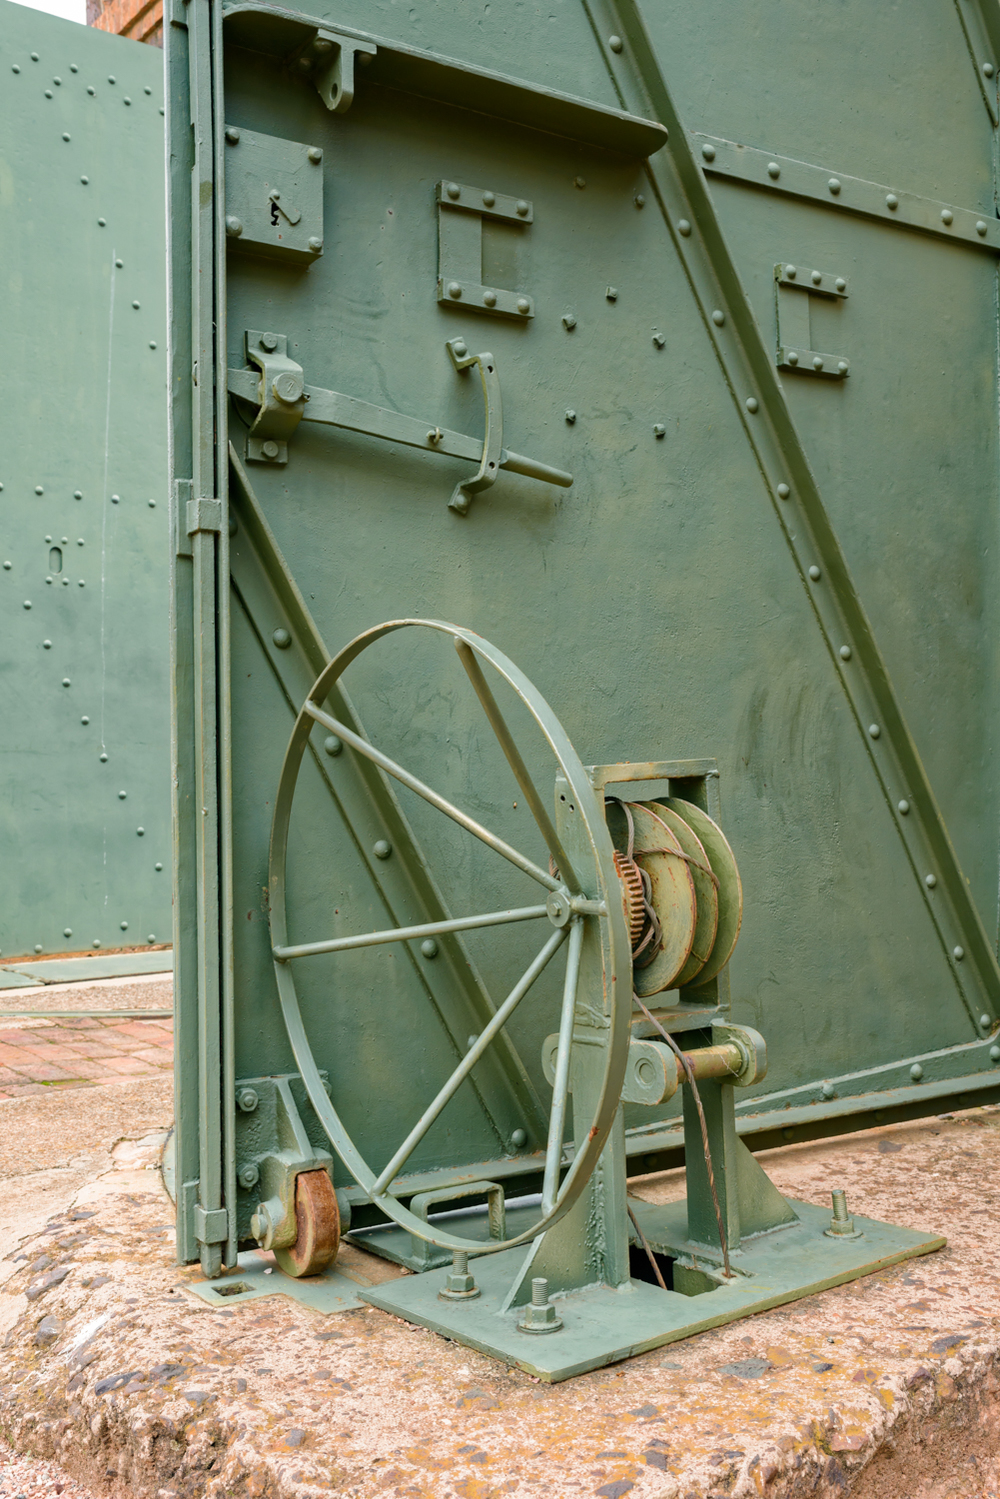 Pretoria Fort Klapperkop. Details of the fort entrance door.